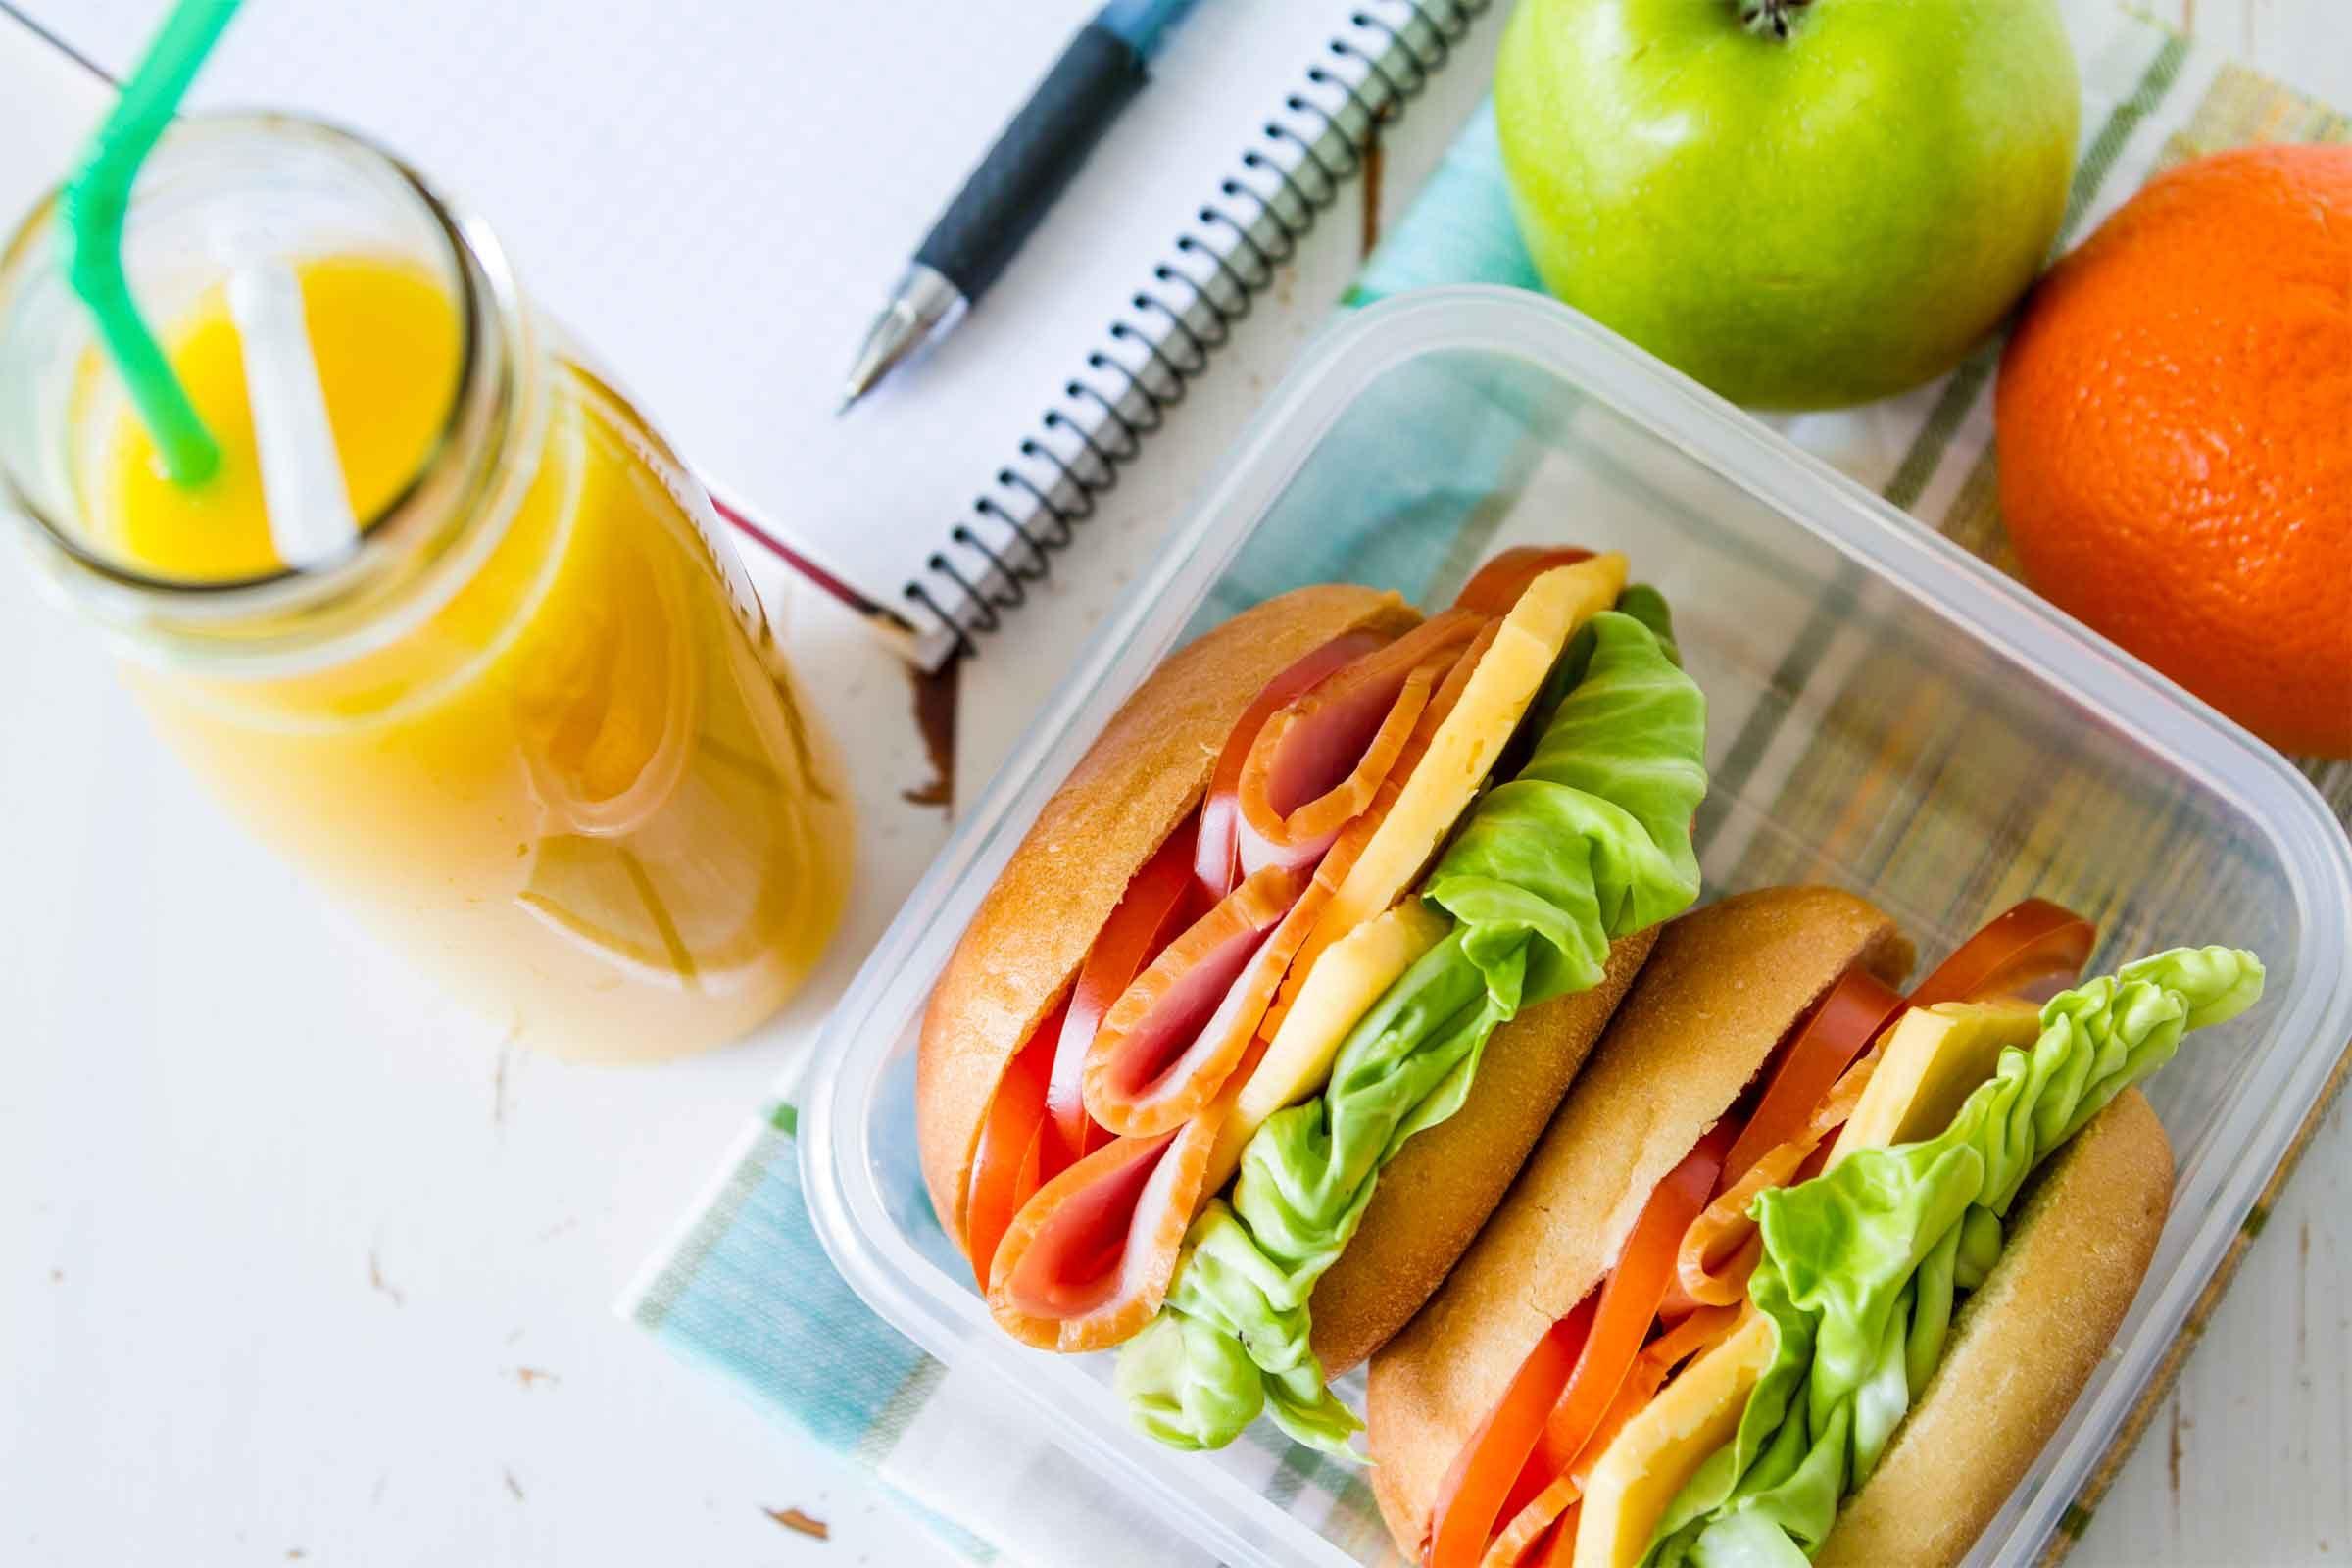 Healthy Outside Food Options